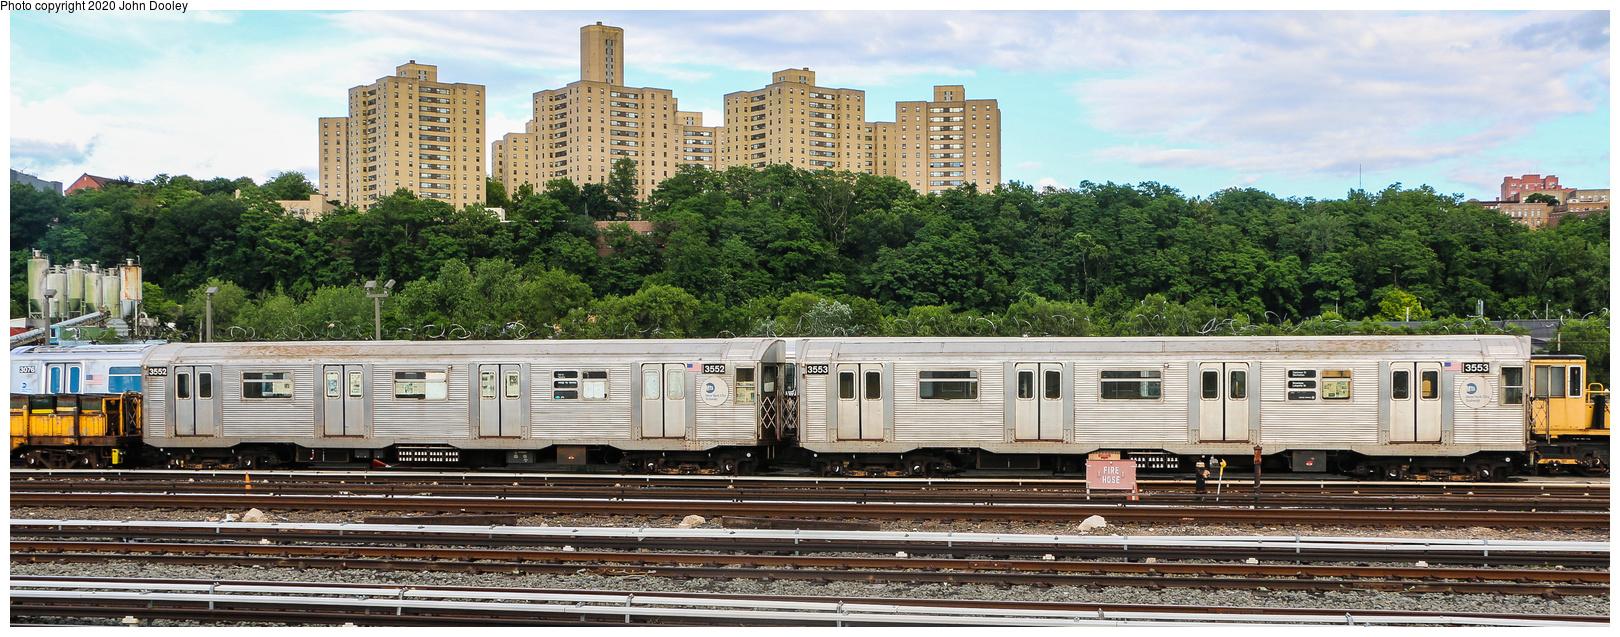 (671k, 1620x637)<br><b>Country:</b> United States<br><b>City:</b> New York<br><b>System:</b> New York City Transit<br><b>Location:</b> 207th Street Yard<br><b>Route:</b> Work Service<br><b>Car:</b> R-32 (Budd, 1964)  3552-3553 <br><b>Photo by:</b> John Dooley<br><b>Date:</b> 6/15/2018<br><b>Notes:</b> Garbage motors<br><b>Viewed (this week/total):</b> 20 / 80